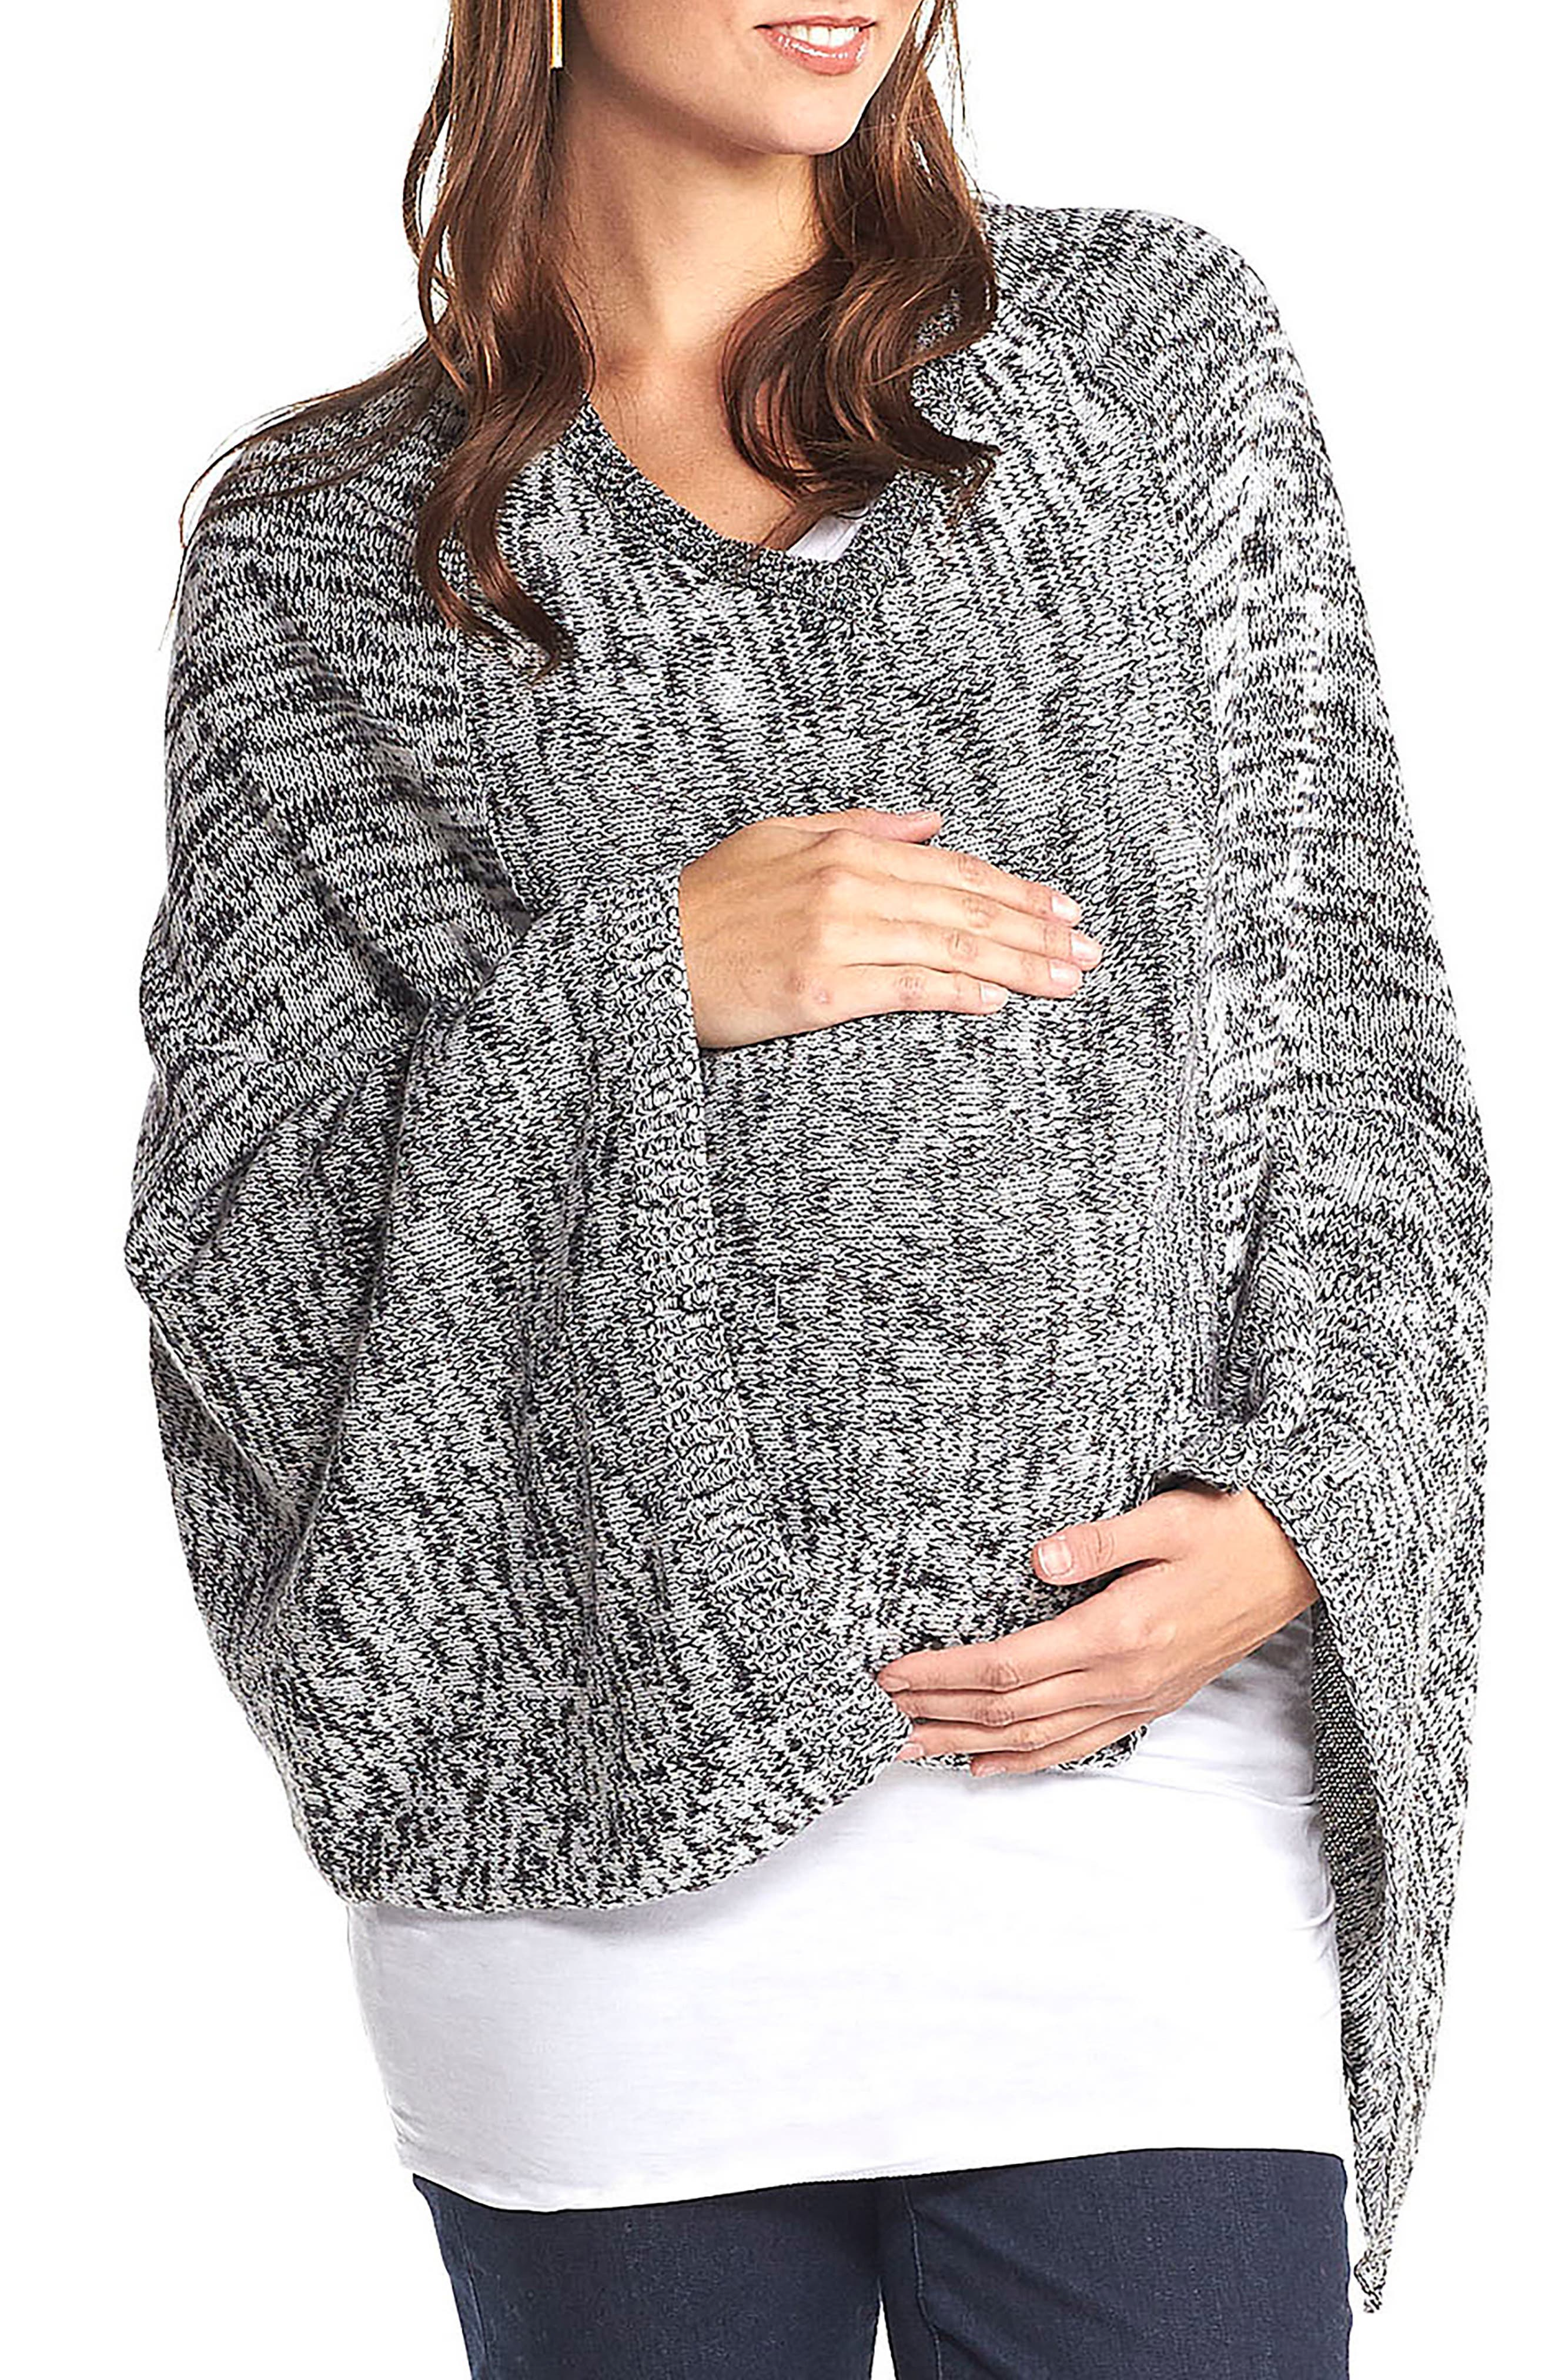 'Alana' Wool Maternity Poncho,                         Main,                         color, BLACK/WHITE